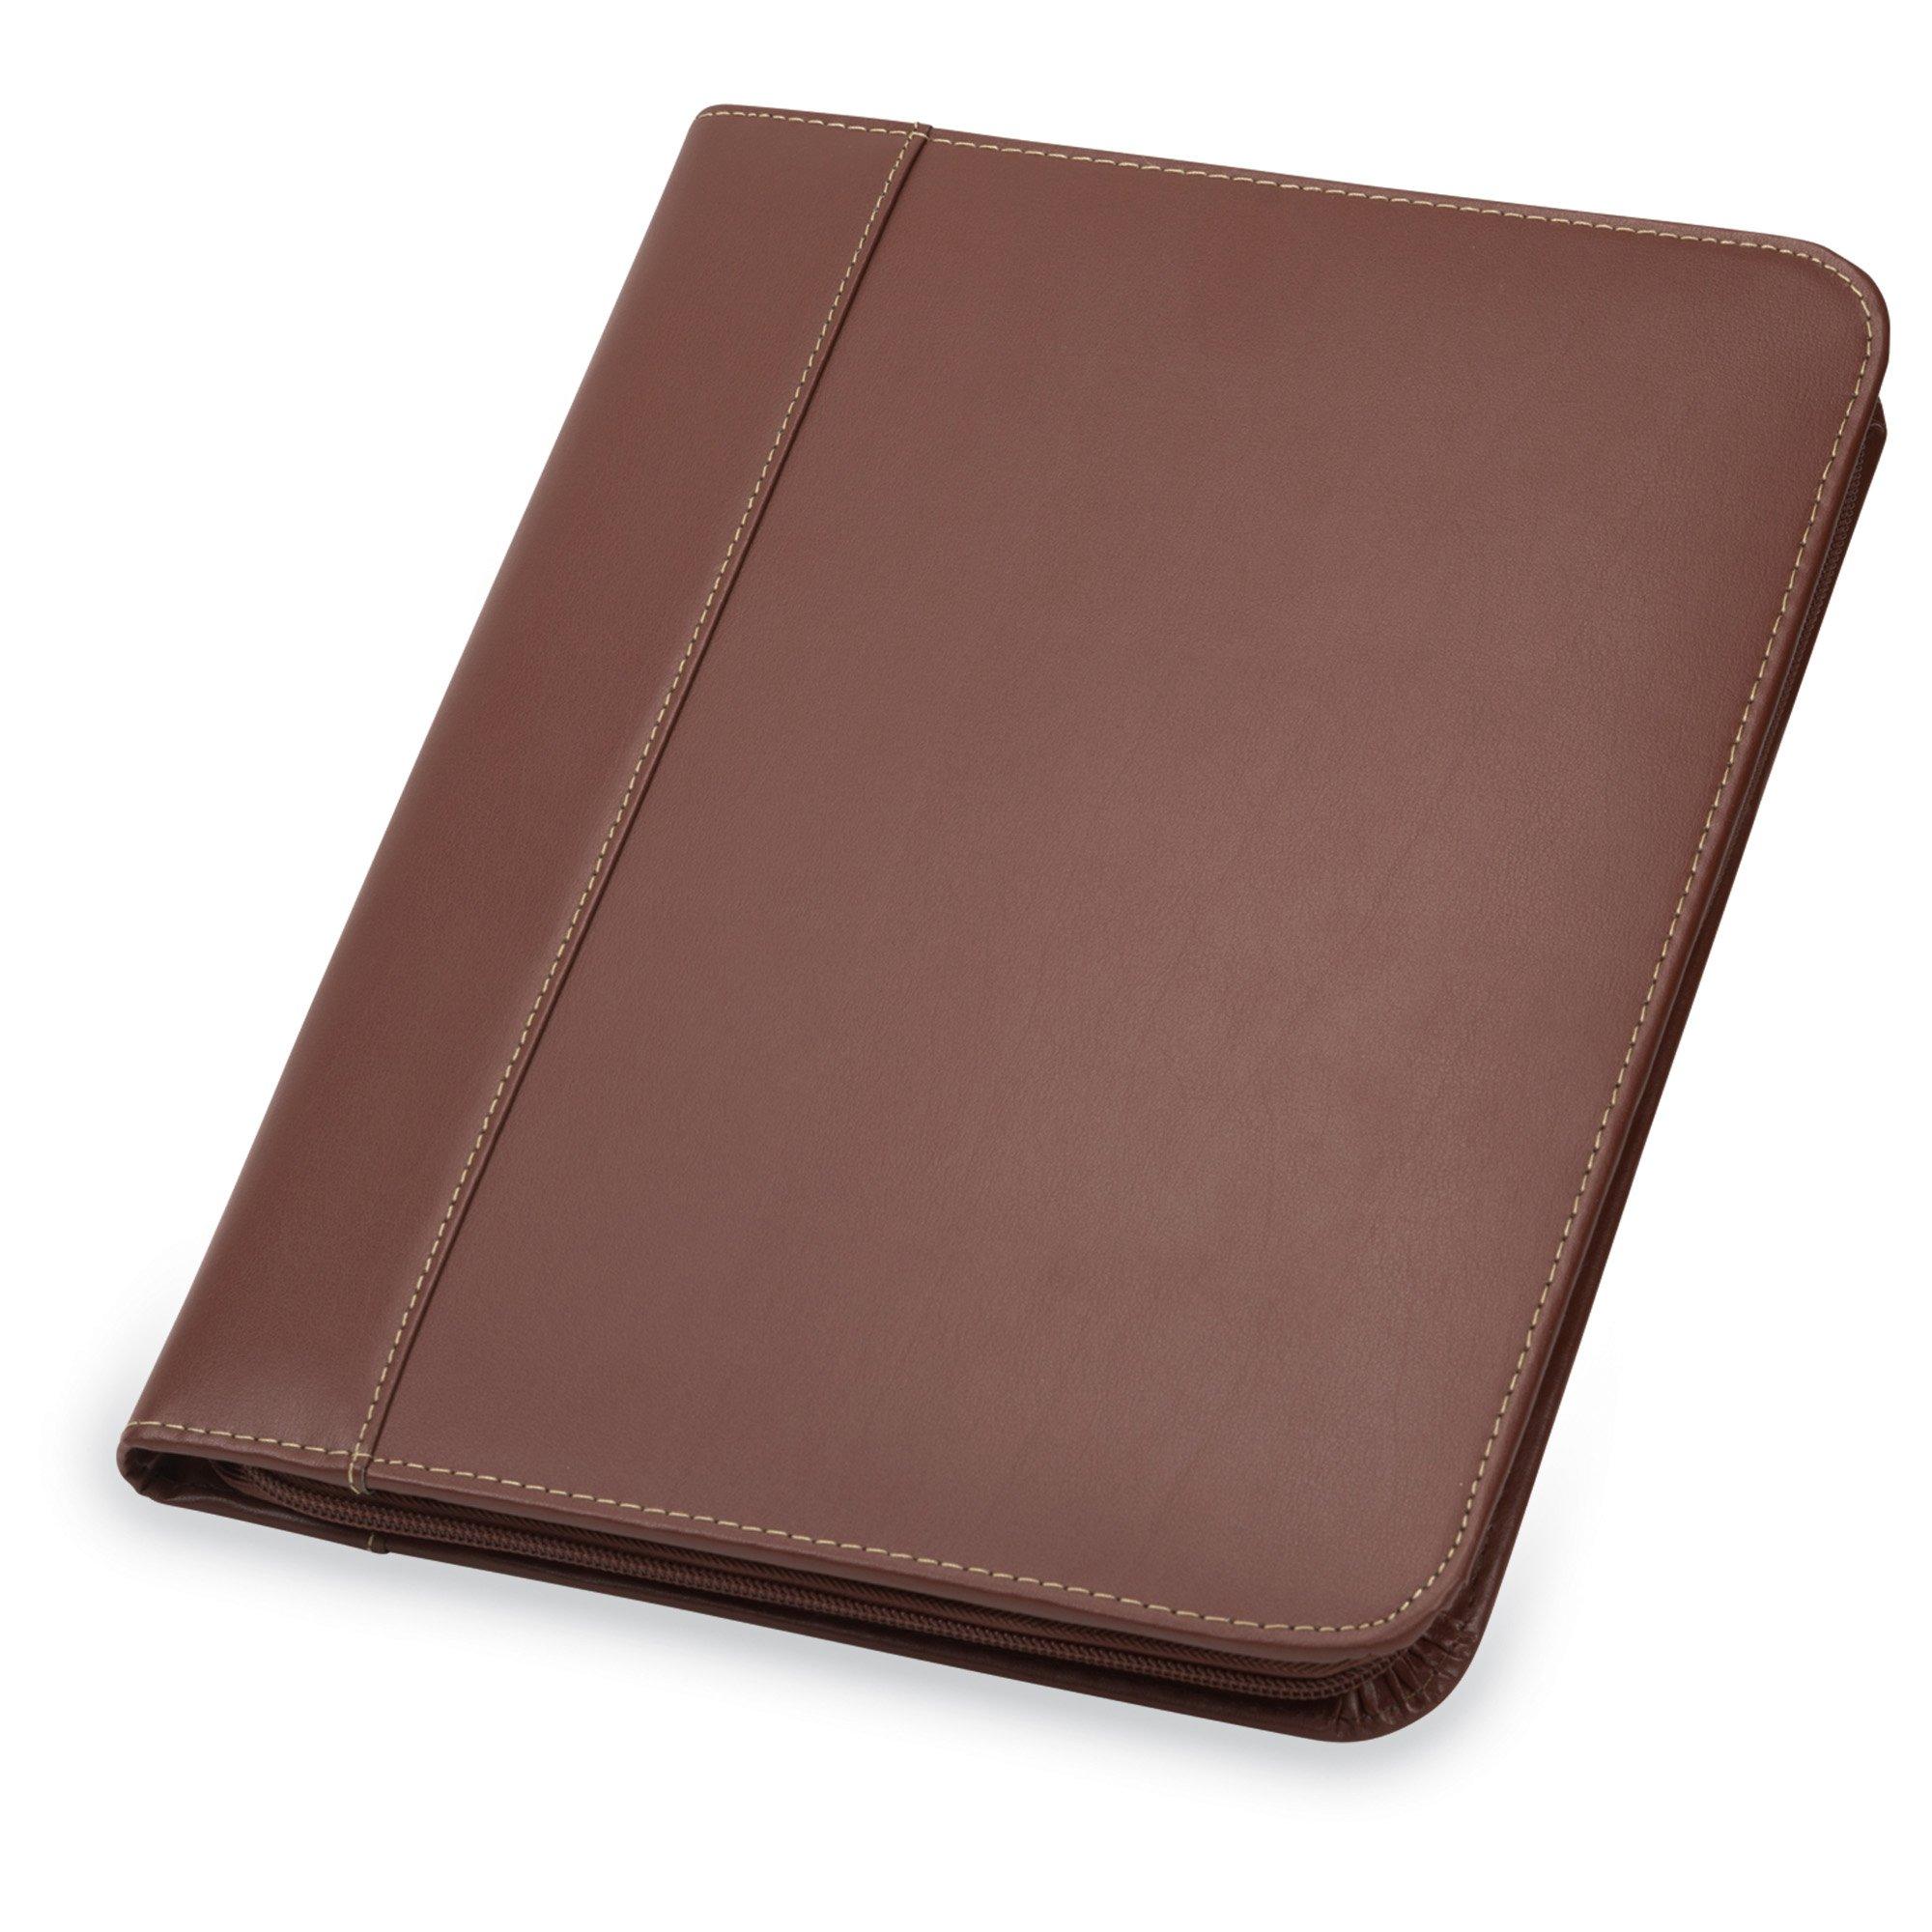 Samsill 71726 Contrast Stitch Leather Zipper Padfolio - Lightweight & Stylish Business Portfolio for Men & Women - Resume Portfolio, 8.5 x 11 Writing Pad, Tan/Brown by Samsill